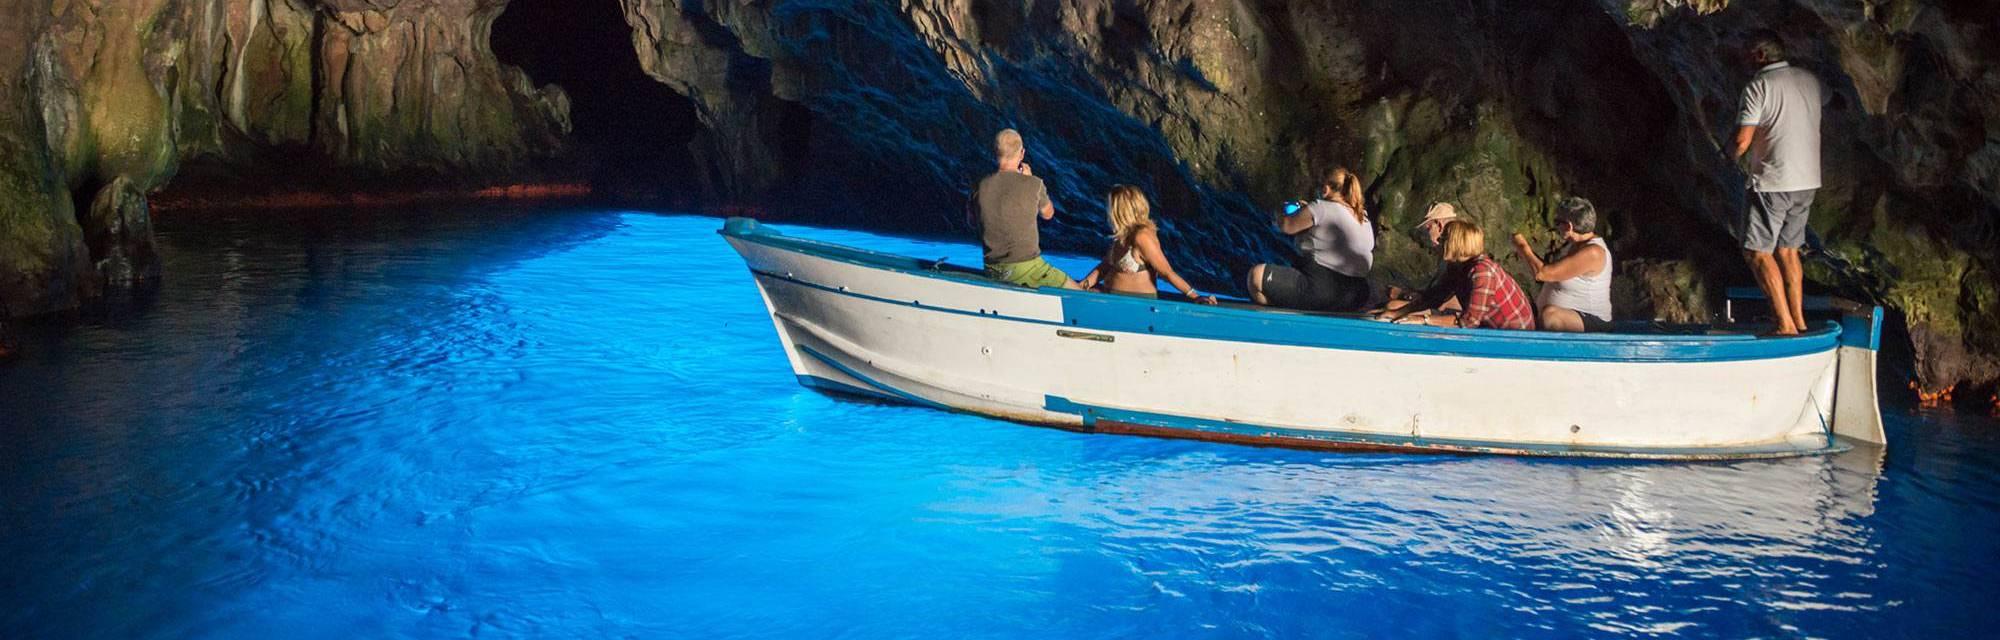 Grotte di Palinuro, Marbella Club